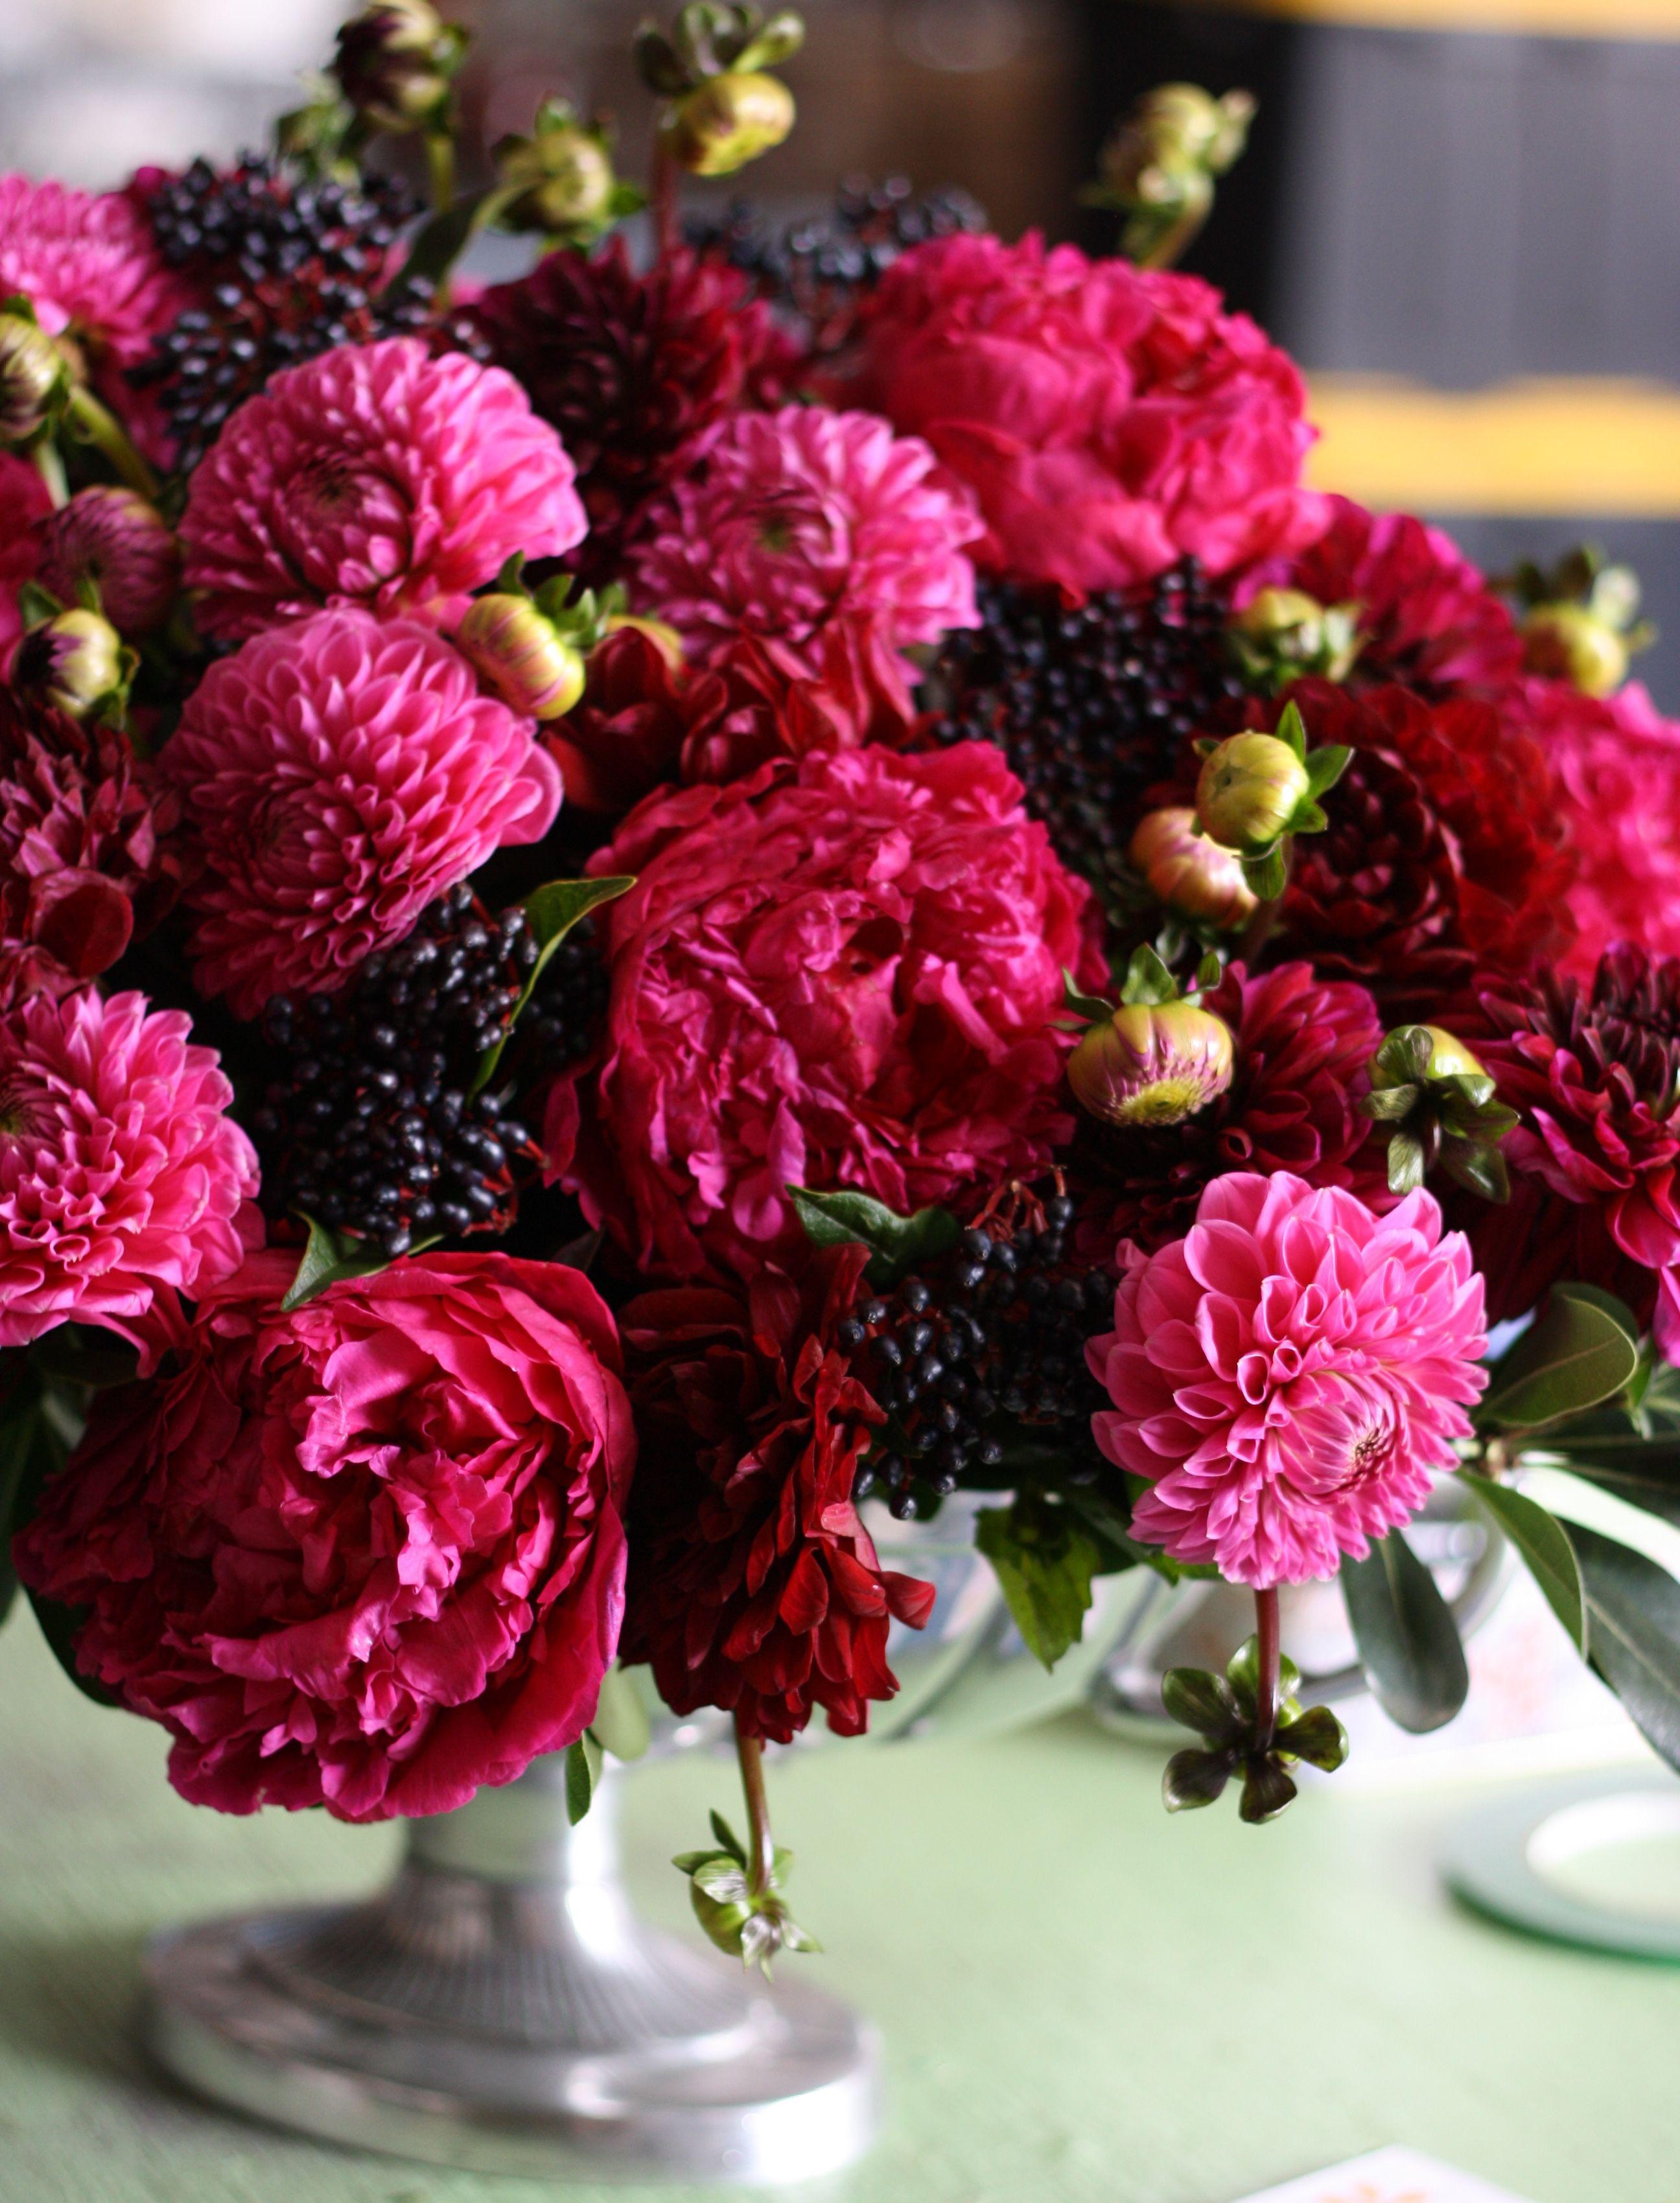 Flirty Fleurs The Florist Blog Inspiration For Floral Designers Flower Arrangements Dahlia Flower Arrangements Flower Bouquet Wedding